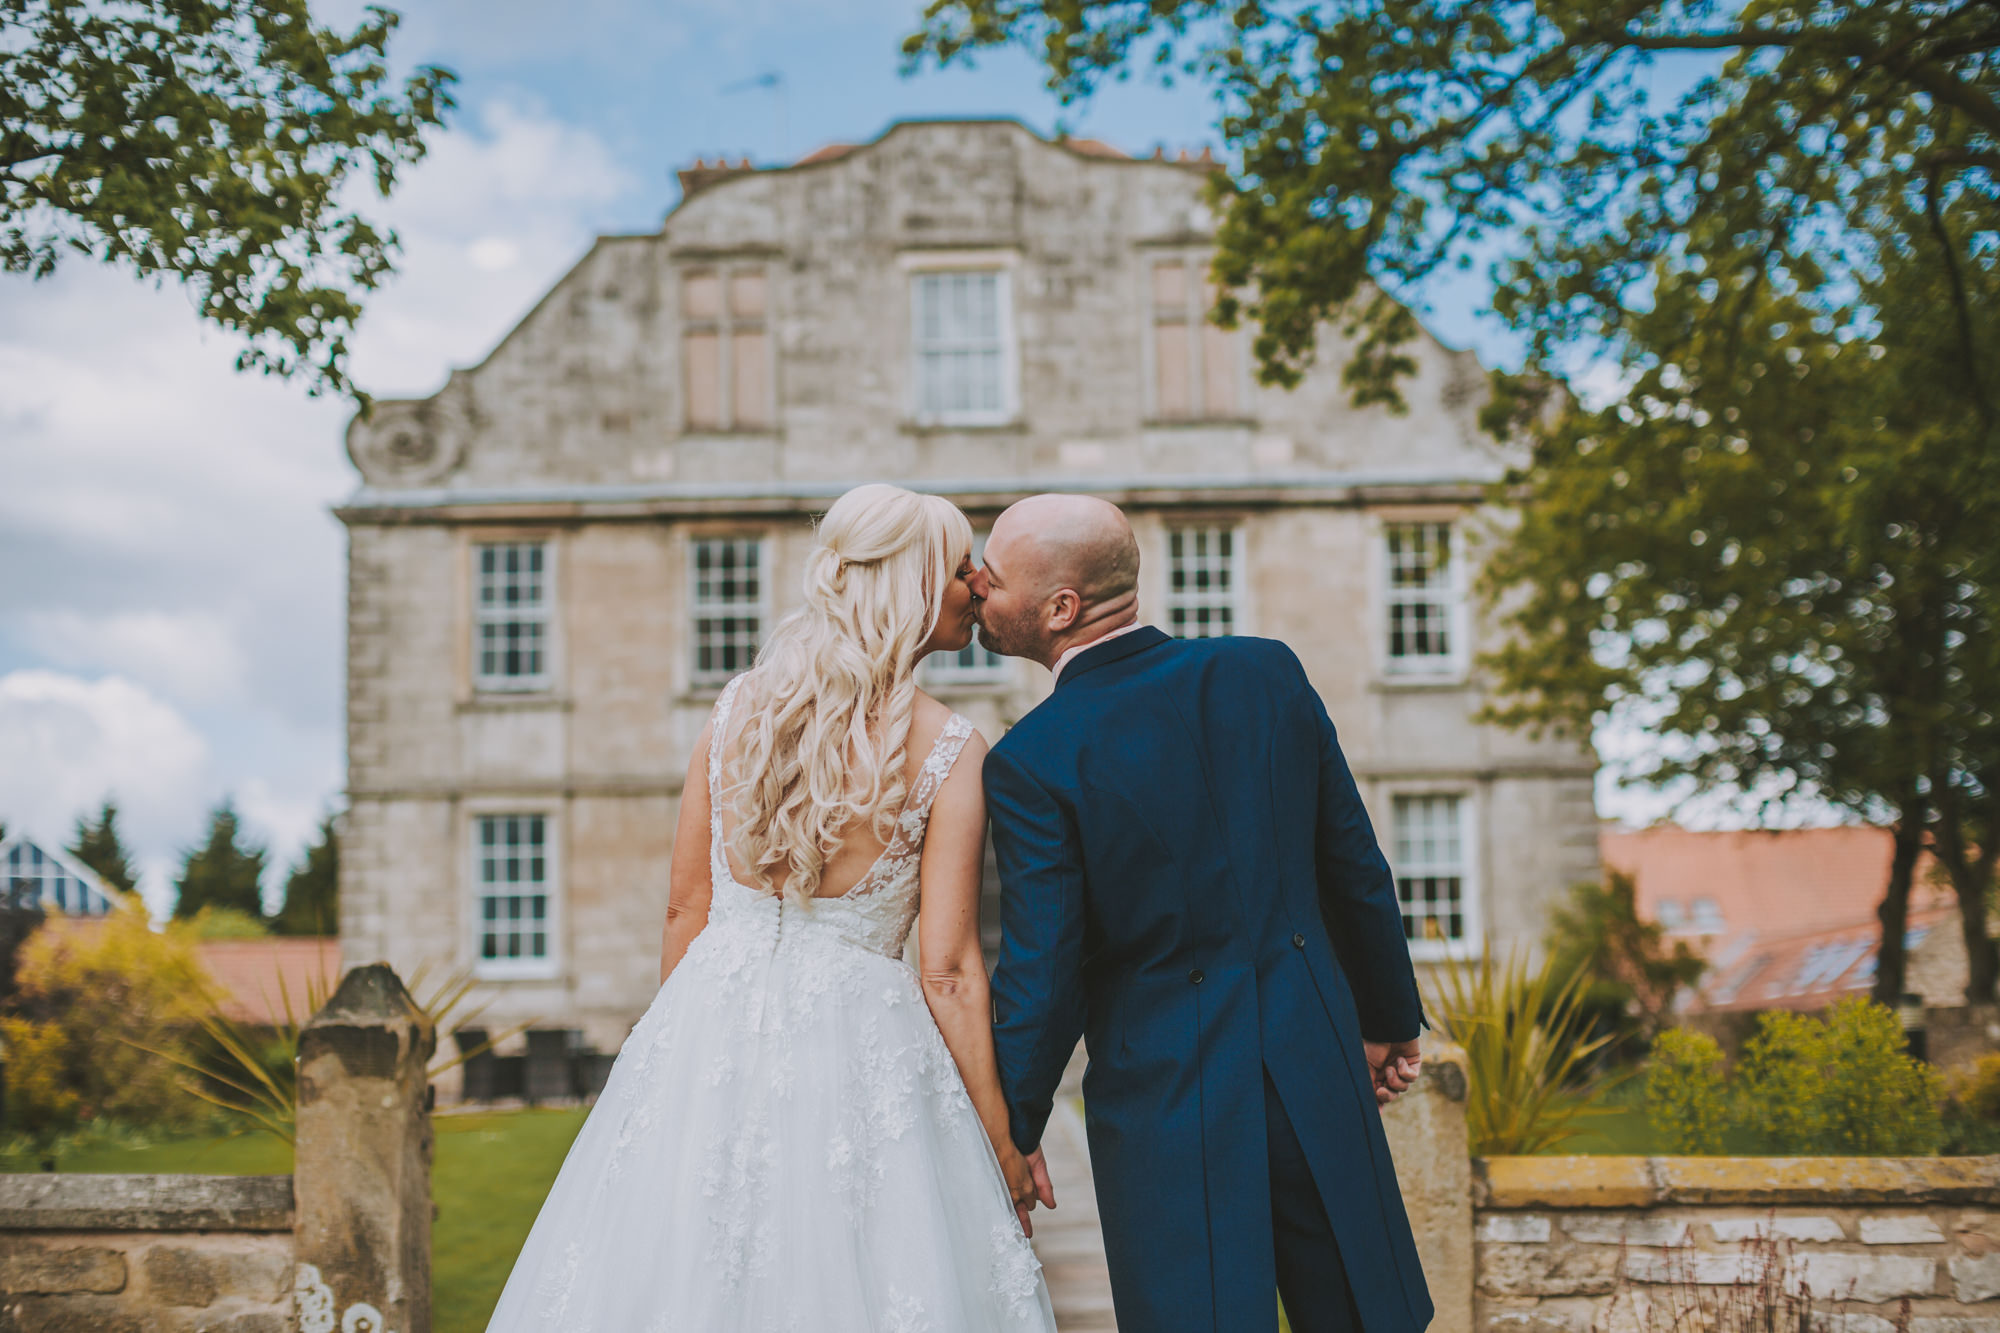 hellaby hall wedding photographers in rotherham, yorkshire-57.jpg